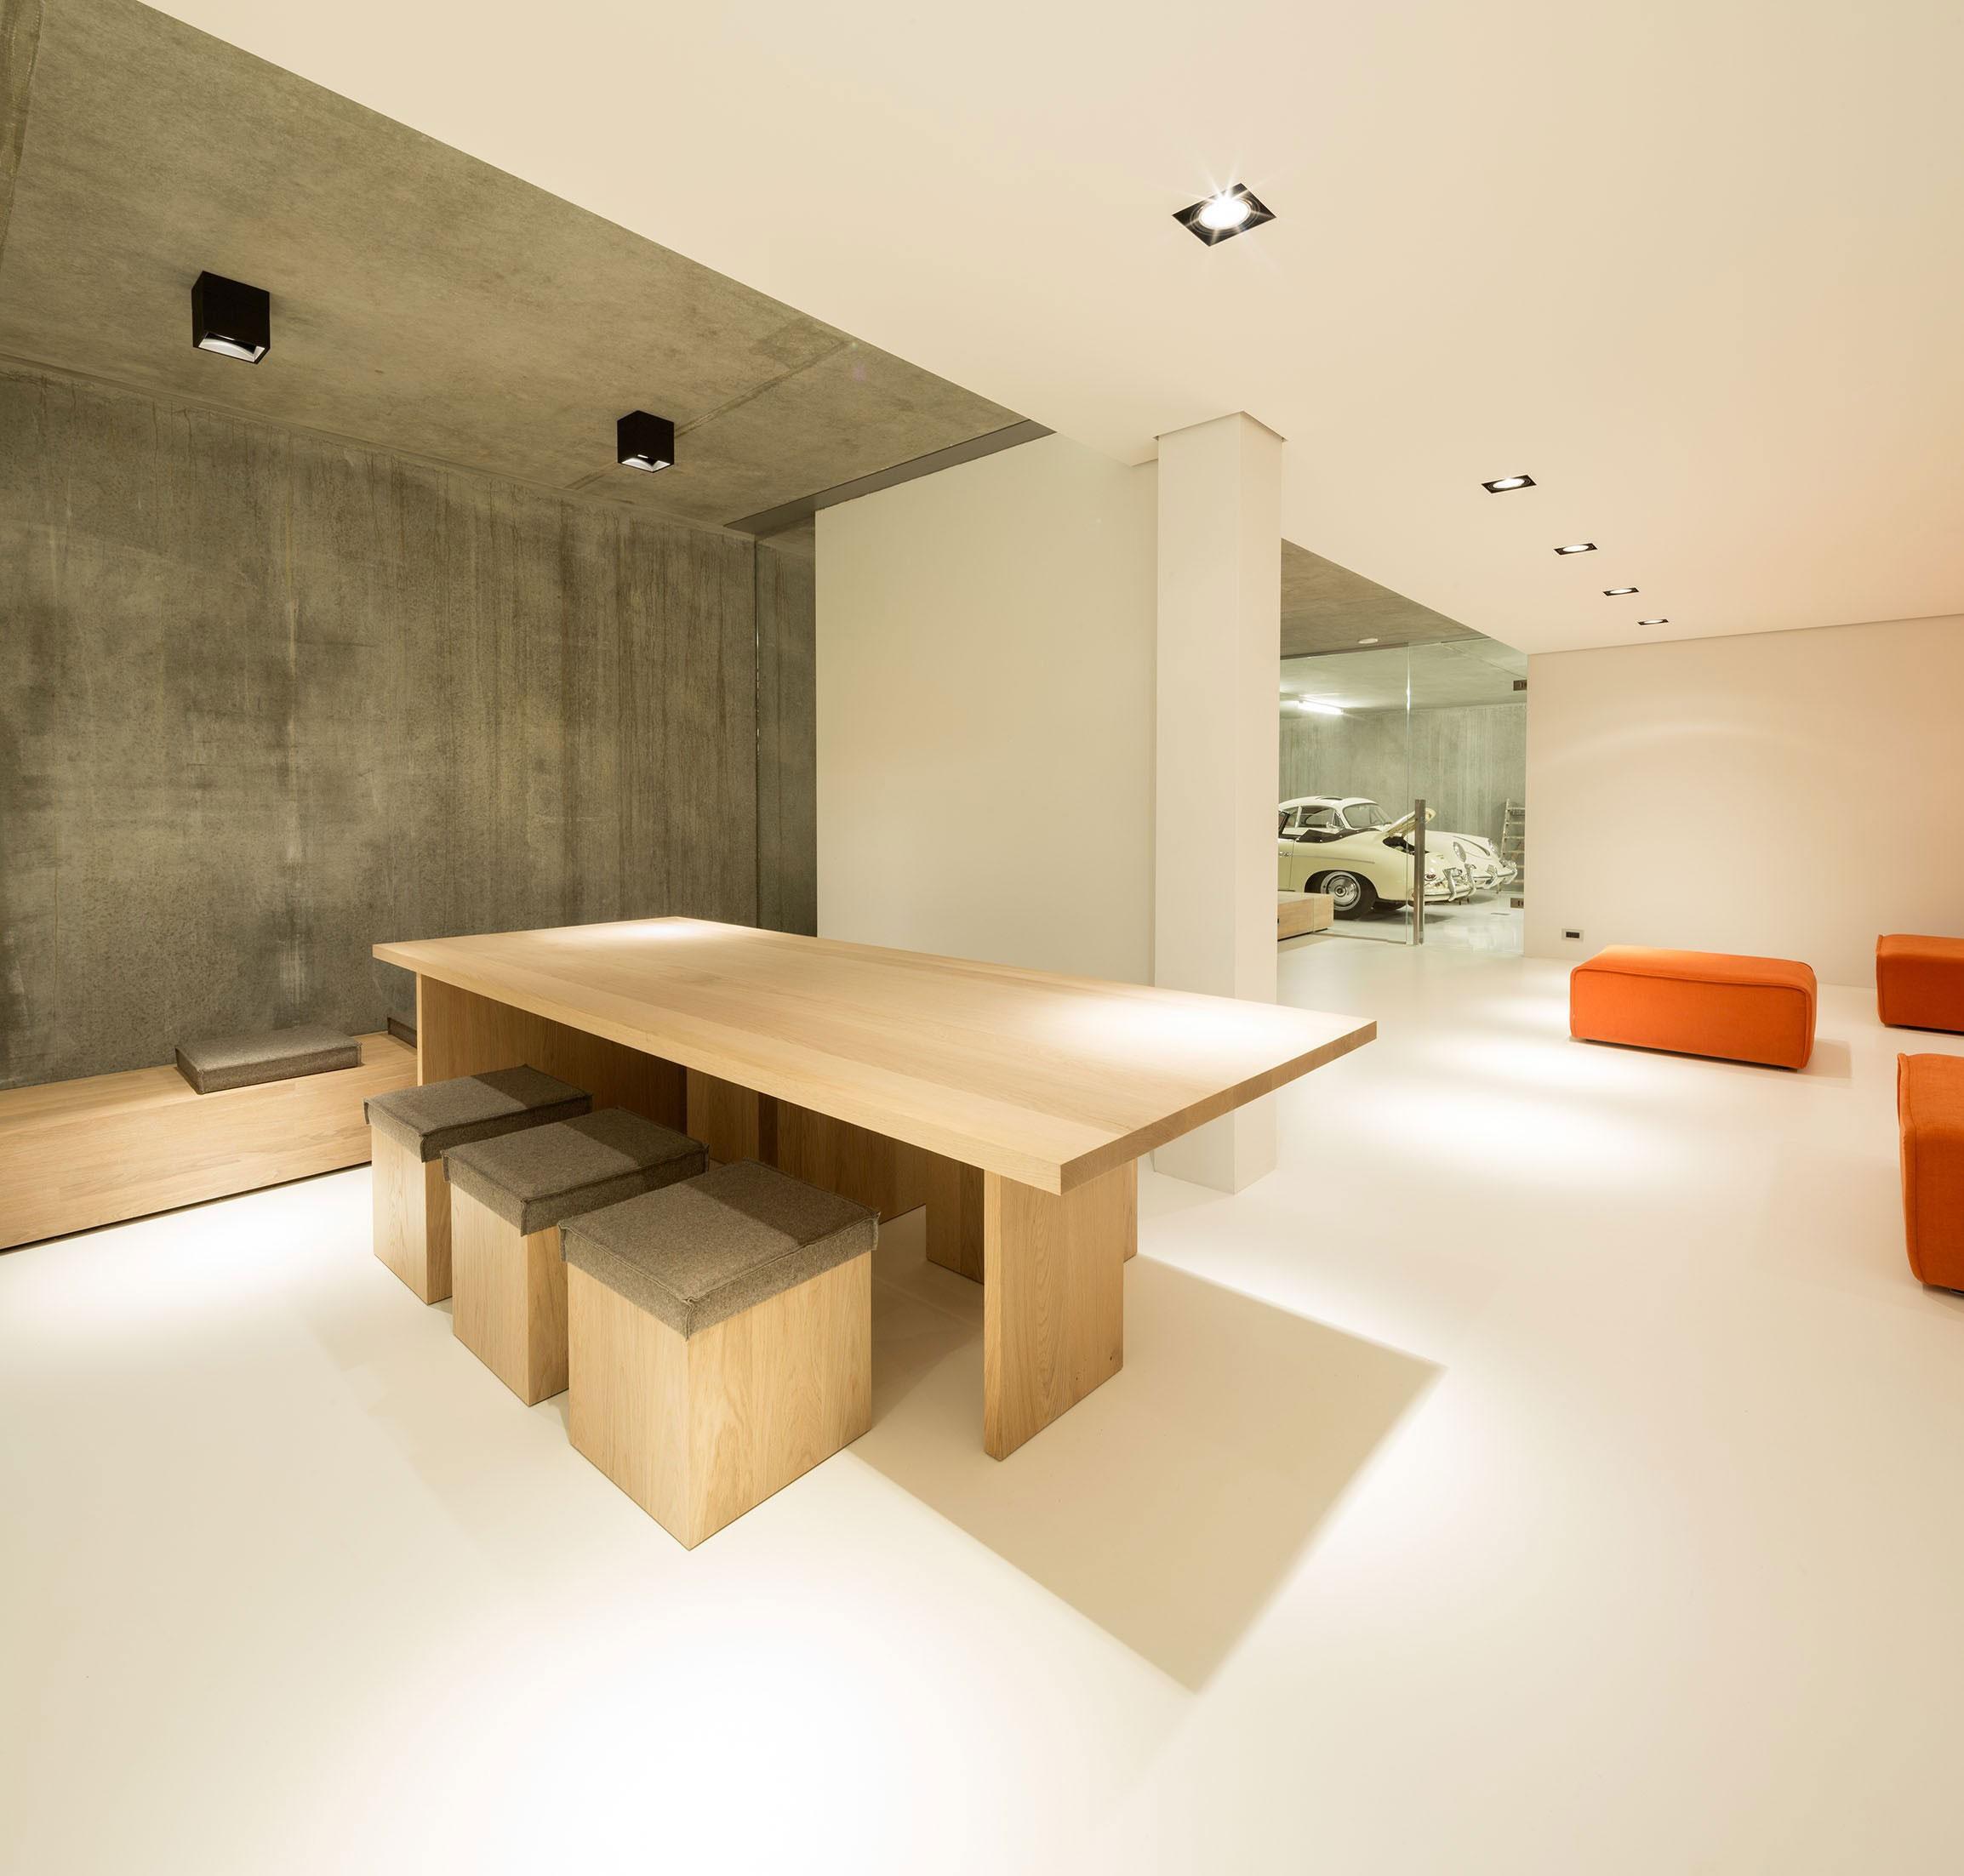 Modern Huizen Country House Located in a Quiet Rural Setting by De Brouwer Binnenwerk-10